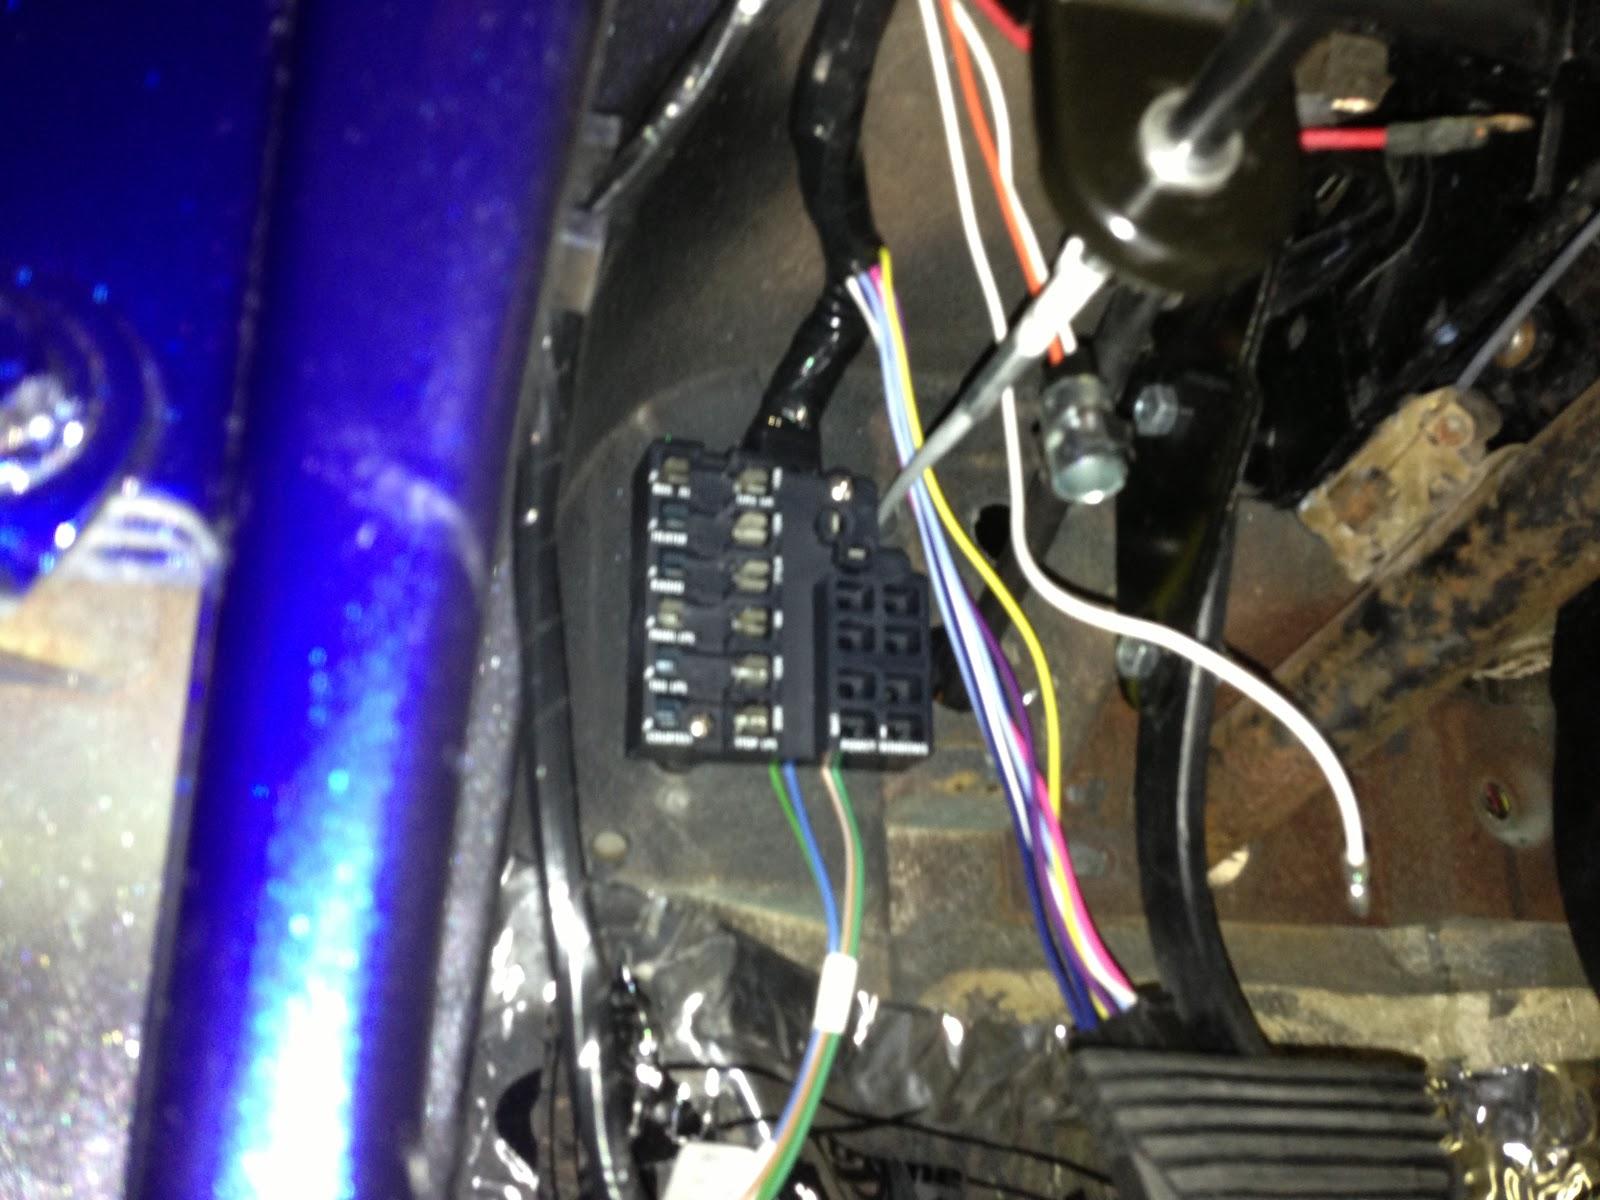 Corvette Fuse Box Diagram Wiring Harness Wiring Diagram Wiring